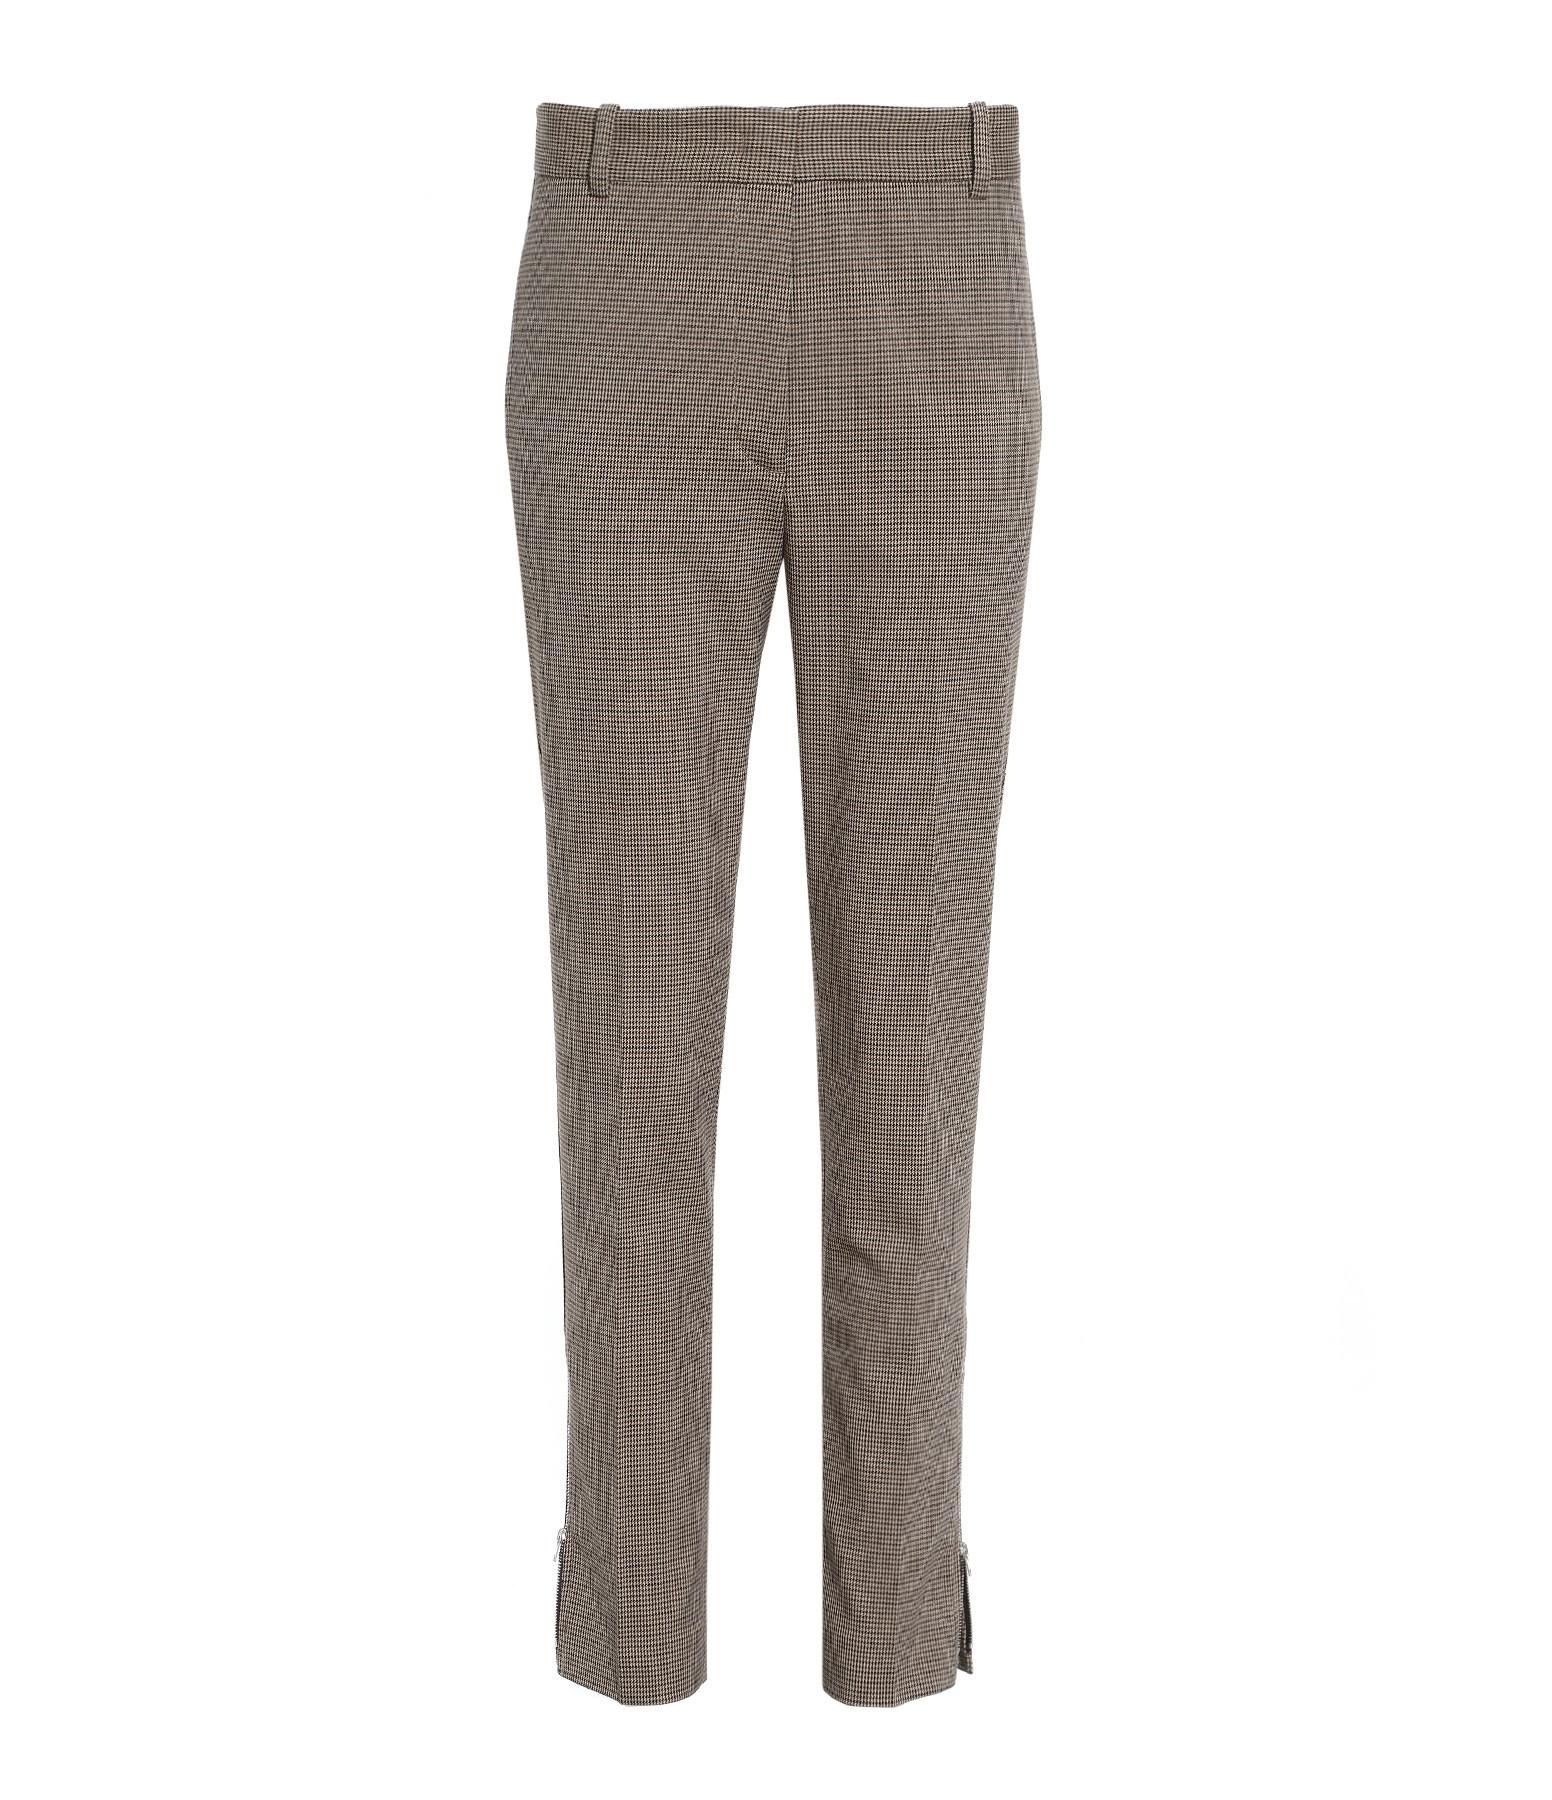 JOSEPH - Pantalon Zoomy Dogtooth Stretch Coton Camel